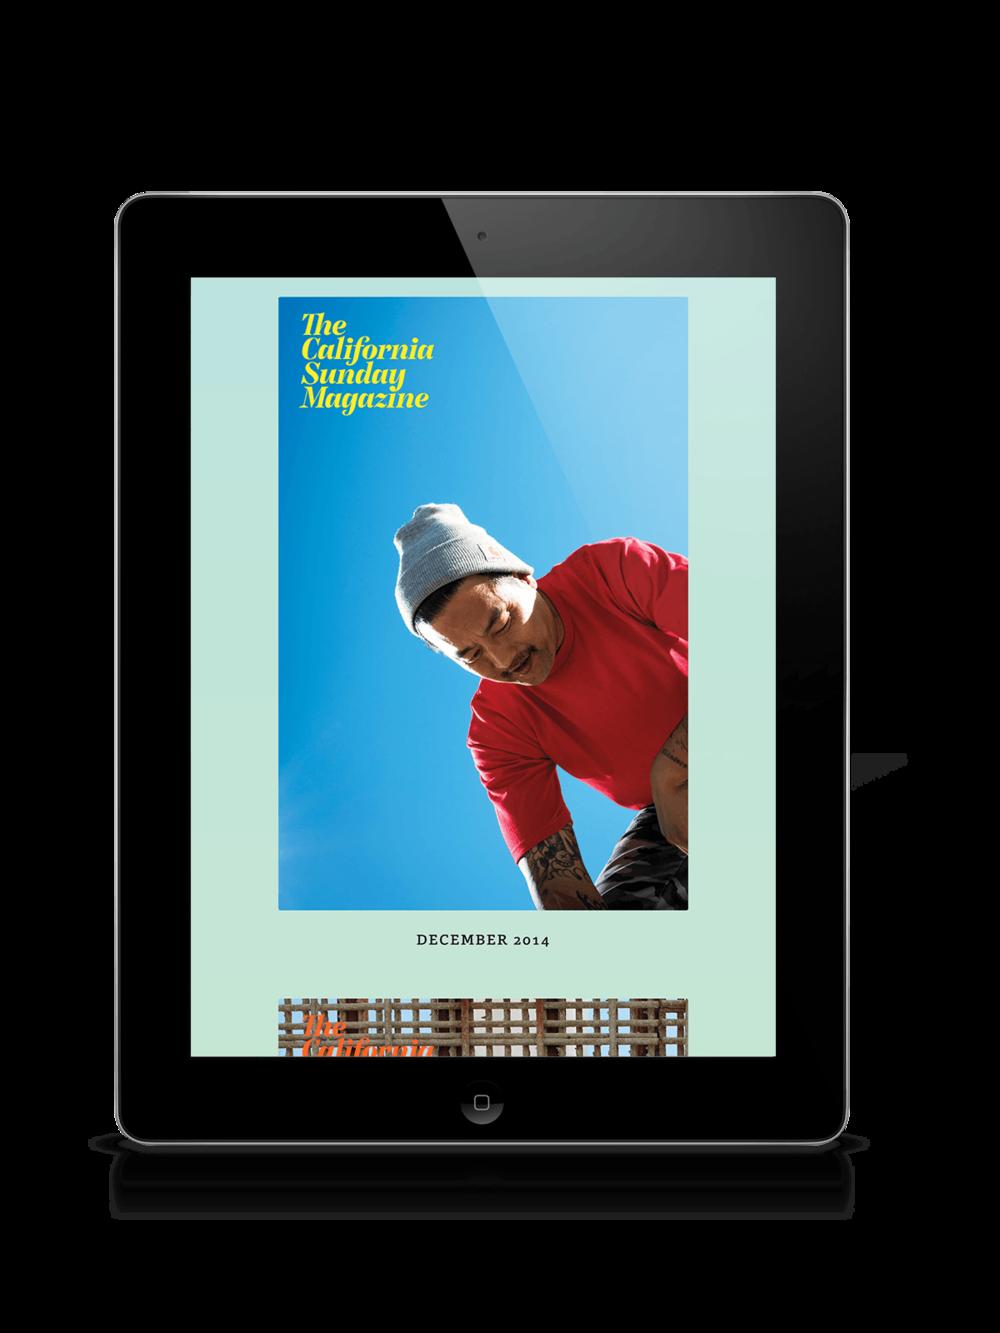 California Sunday Magazine Cover Dec14 iPad Vertical-2.png